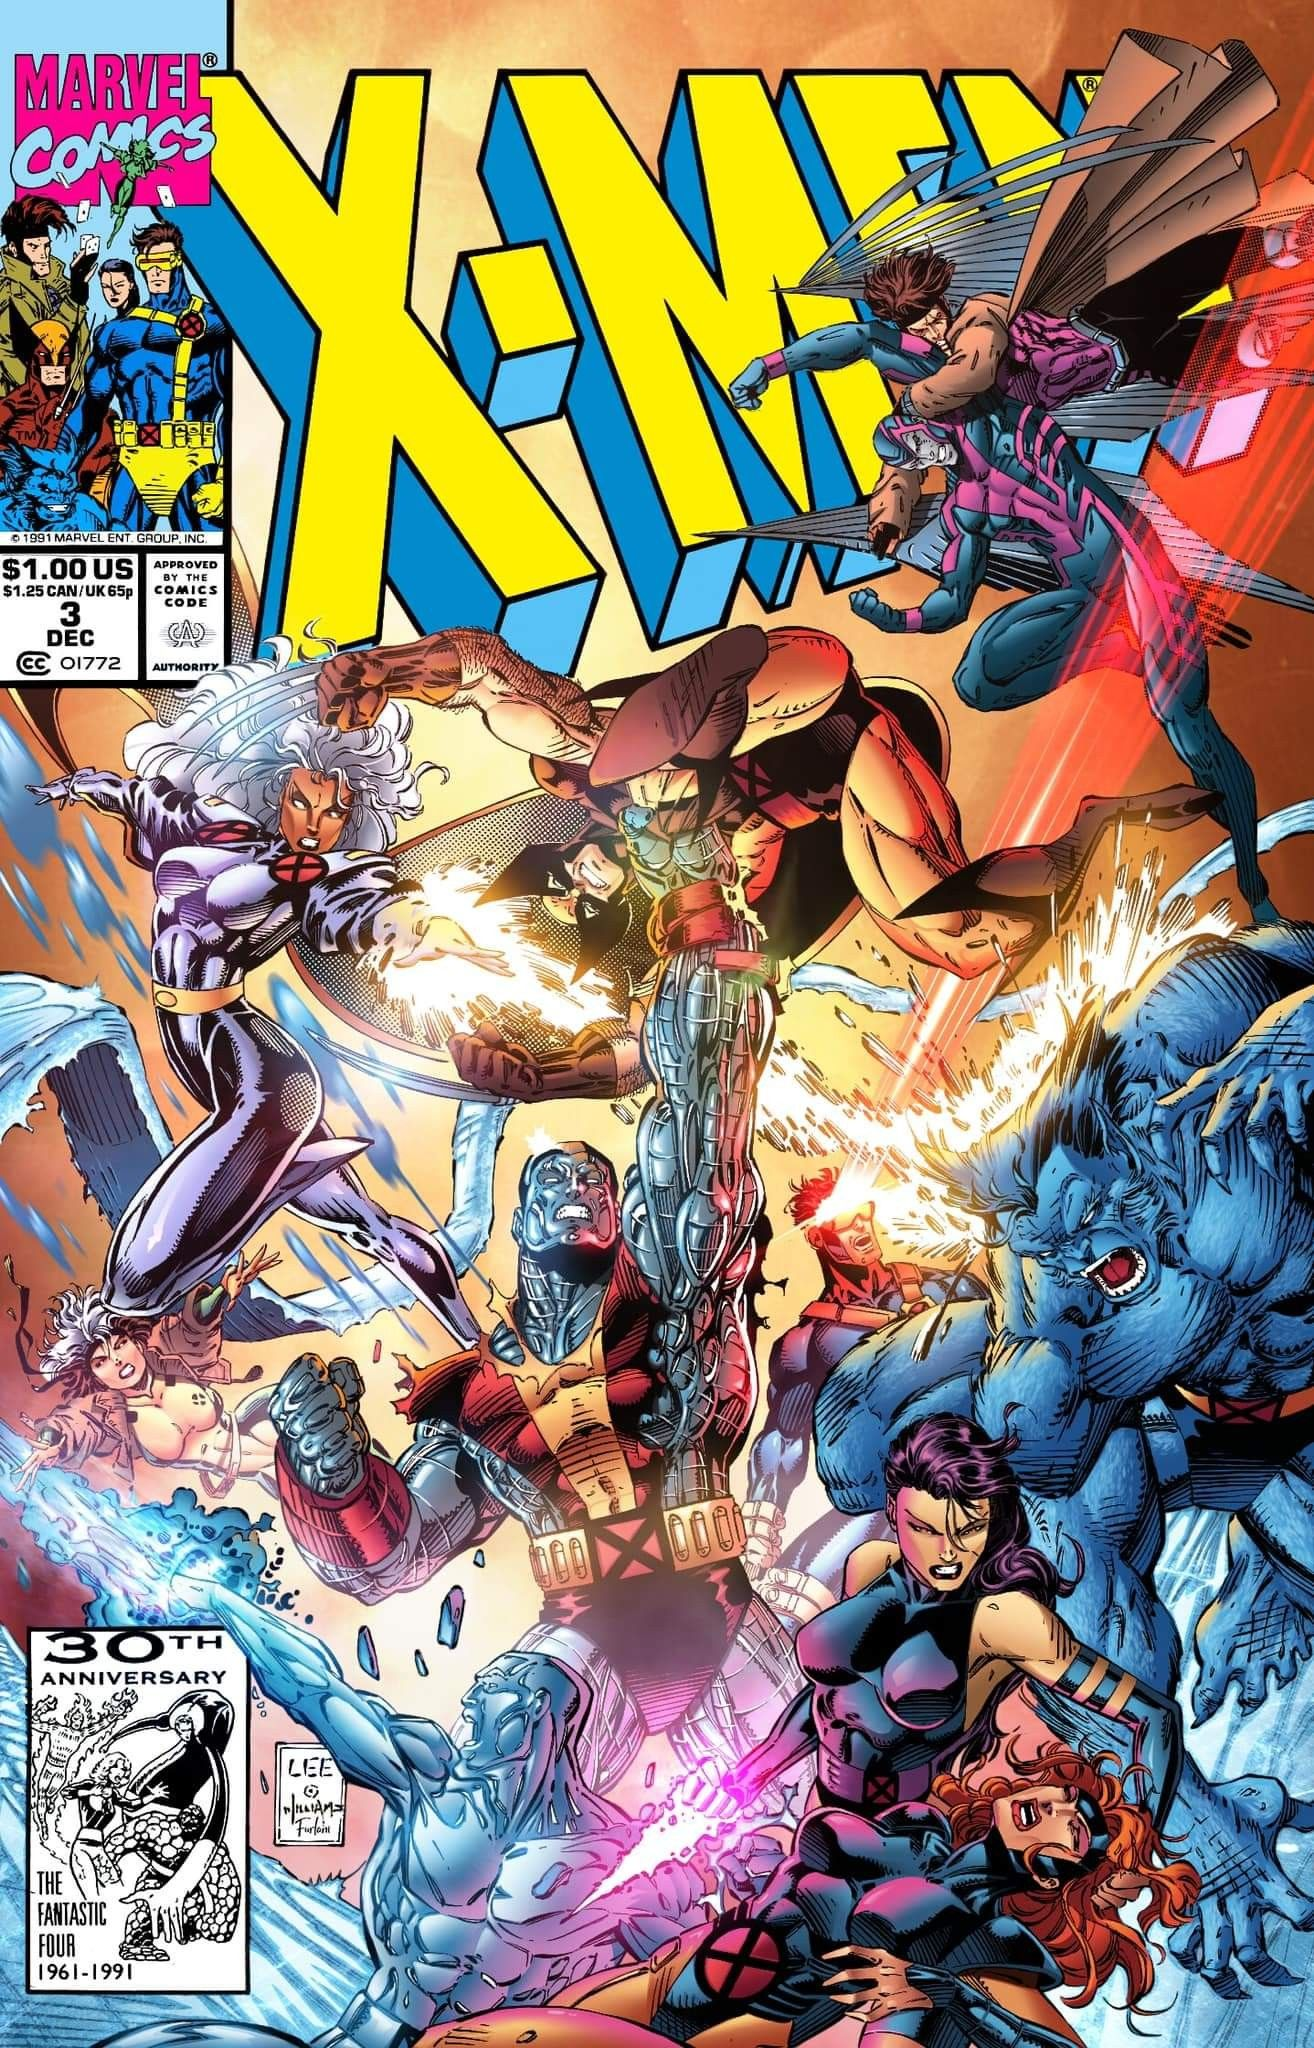 Pin By Craig Bassett On Comic X Men Jim Lee Art Marvel Comics Art Xmen Art